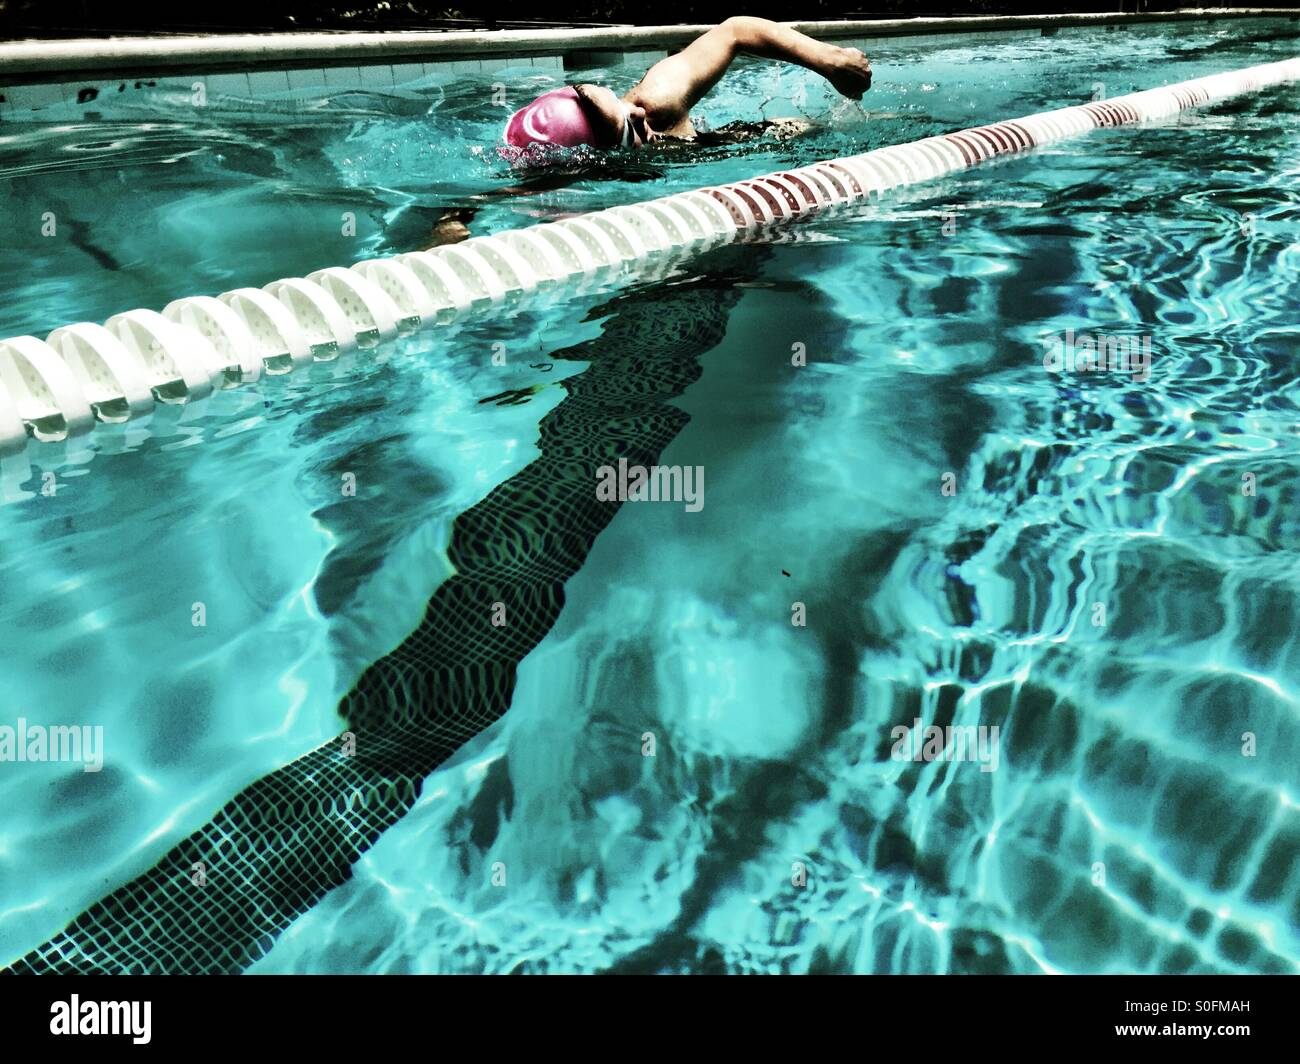 Vista desde el carril adyacente, joven natación freestyle (Australia) métase en la piscina de tamaño olímpico, piscina Foto de stock